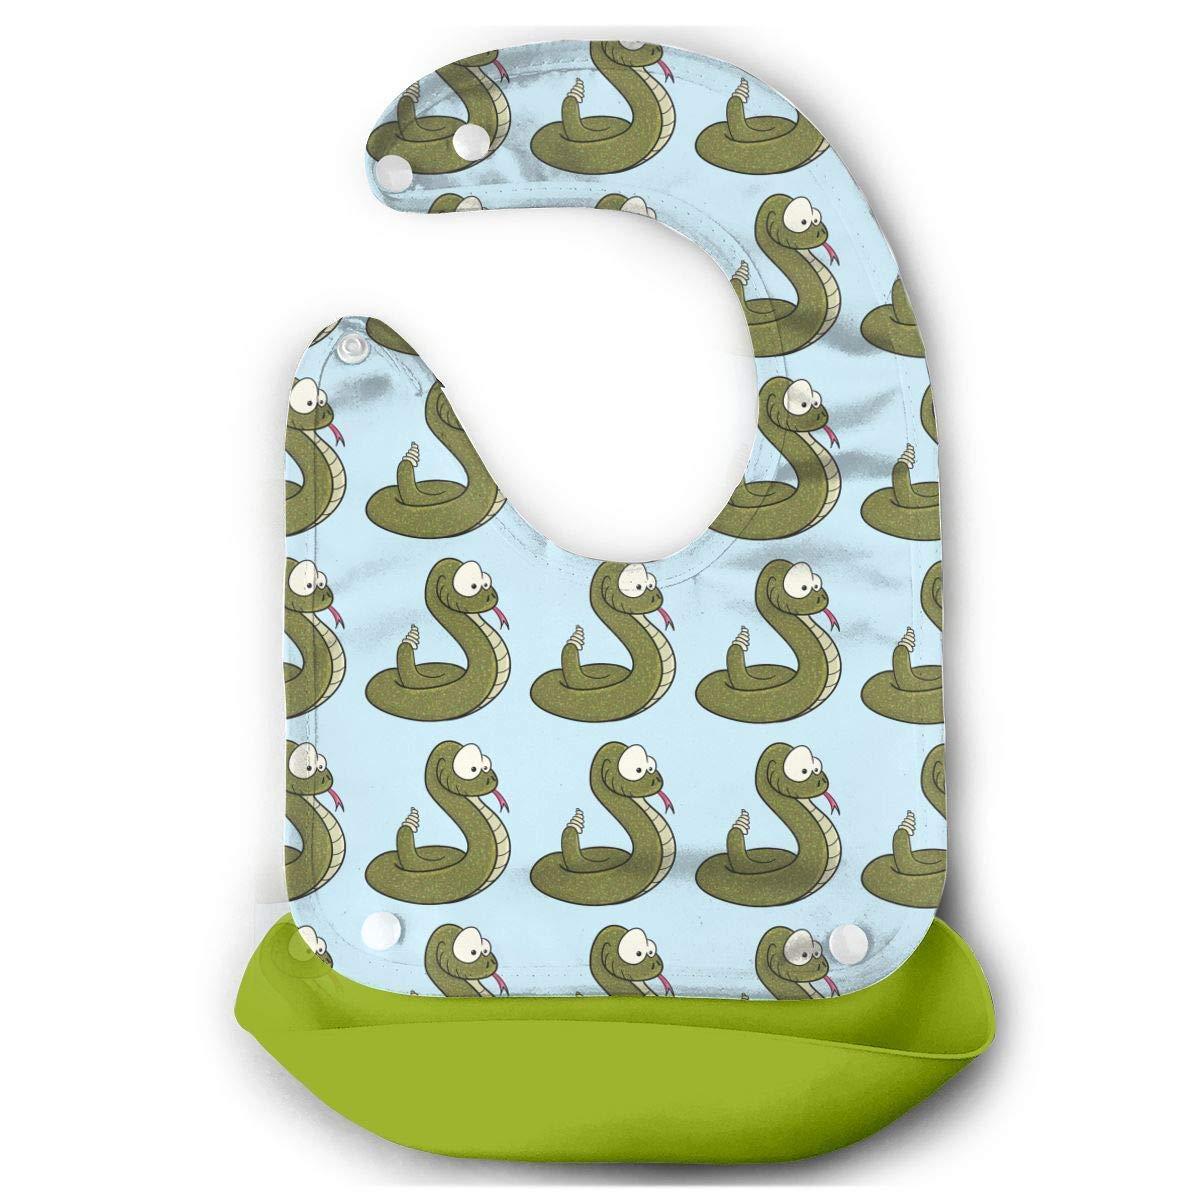 Bibs & Burp Clothes Nursing & Feeding sdchgc Waterproof Silicone Bibs Baby Girls Boys Burp Cloths